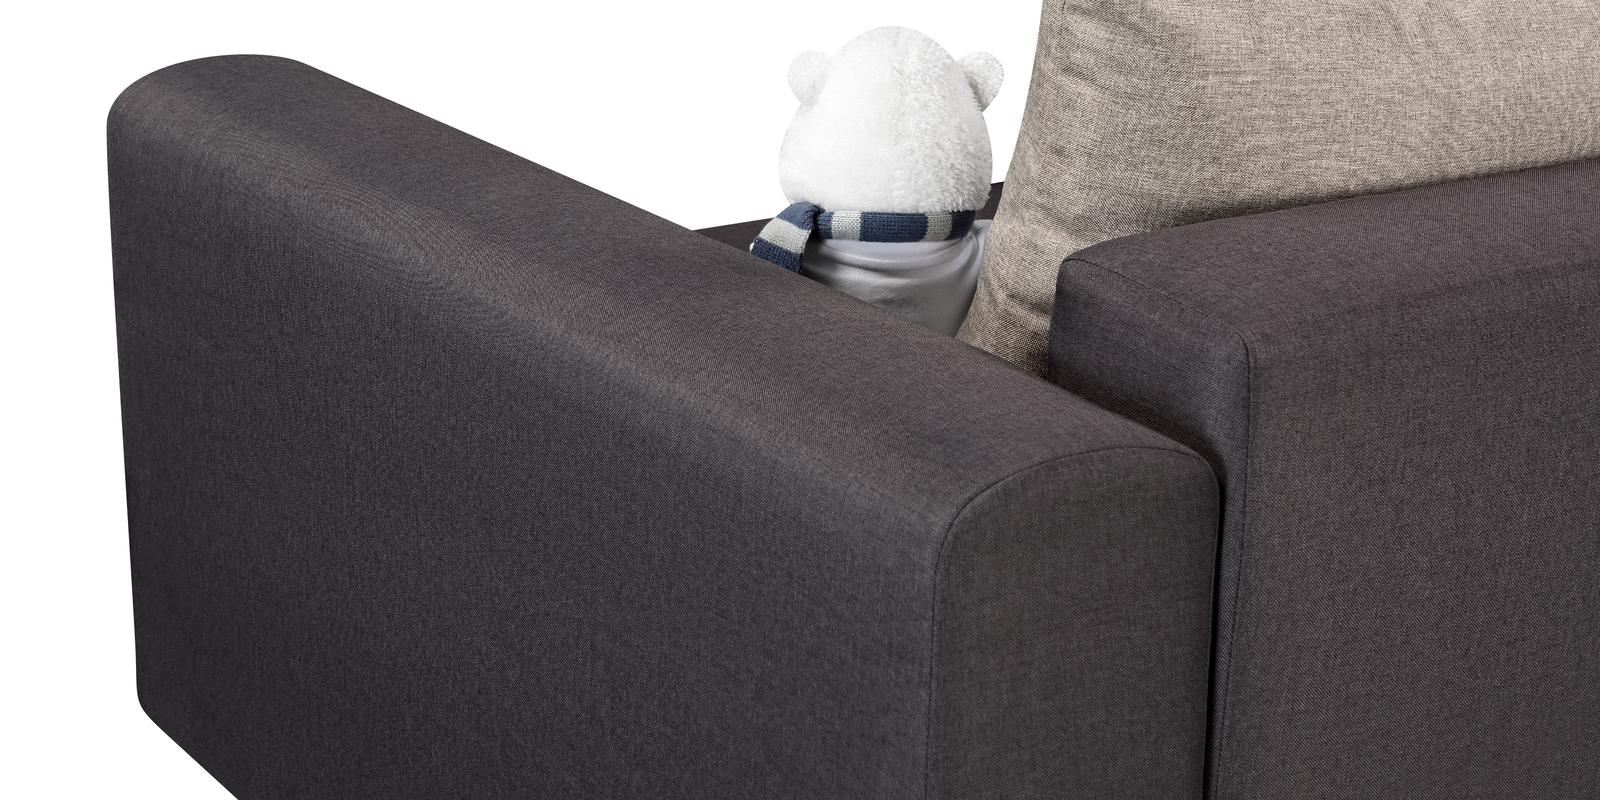 Кресло тканевое Медисон Вариант №2 80 см Kiton тёмно-серый (Рогожка)